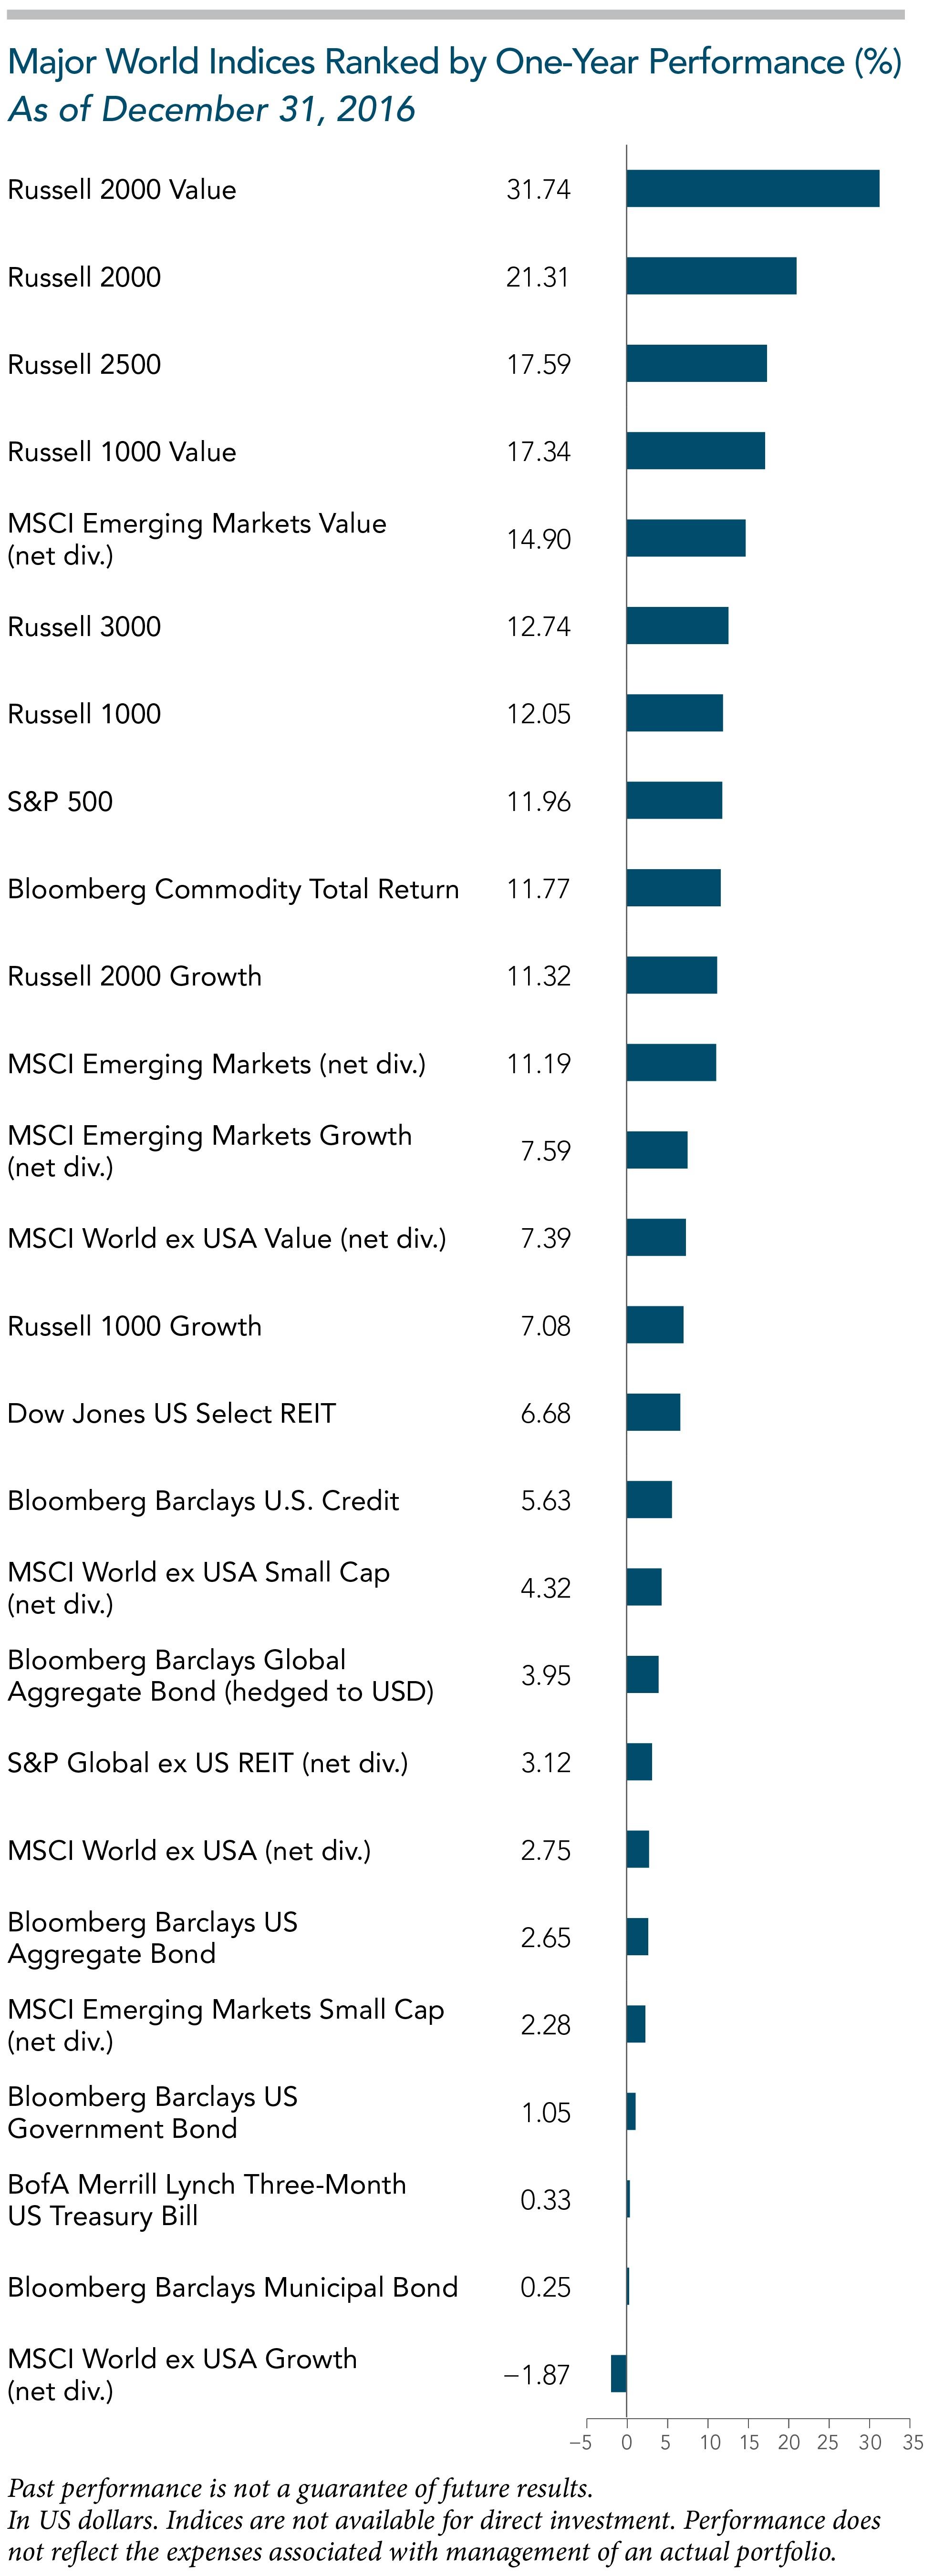 One Year World Indices 2016.jpg